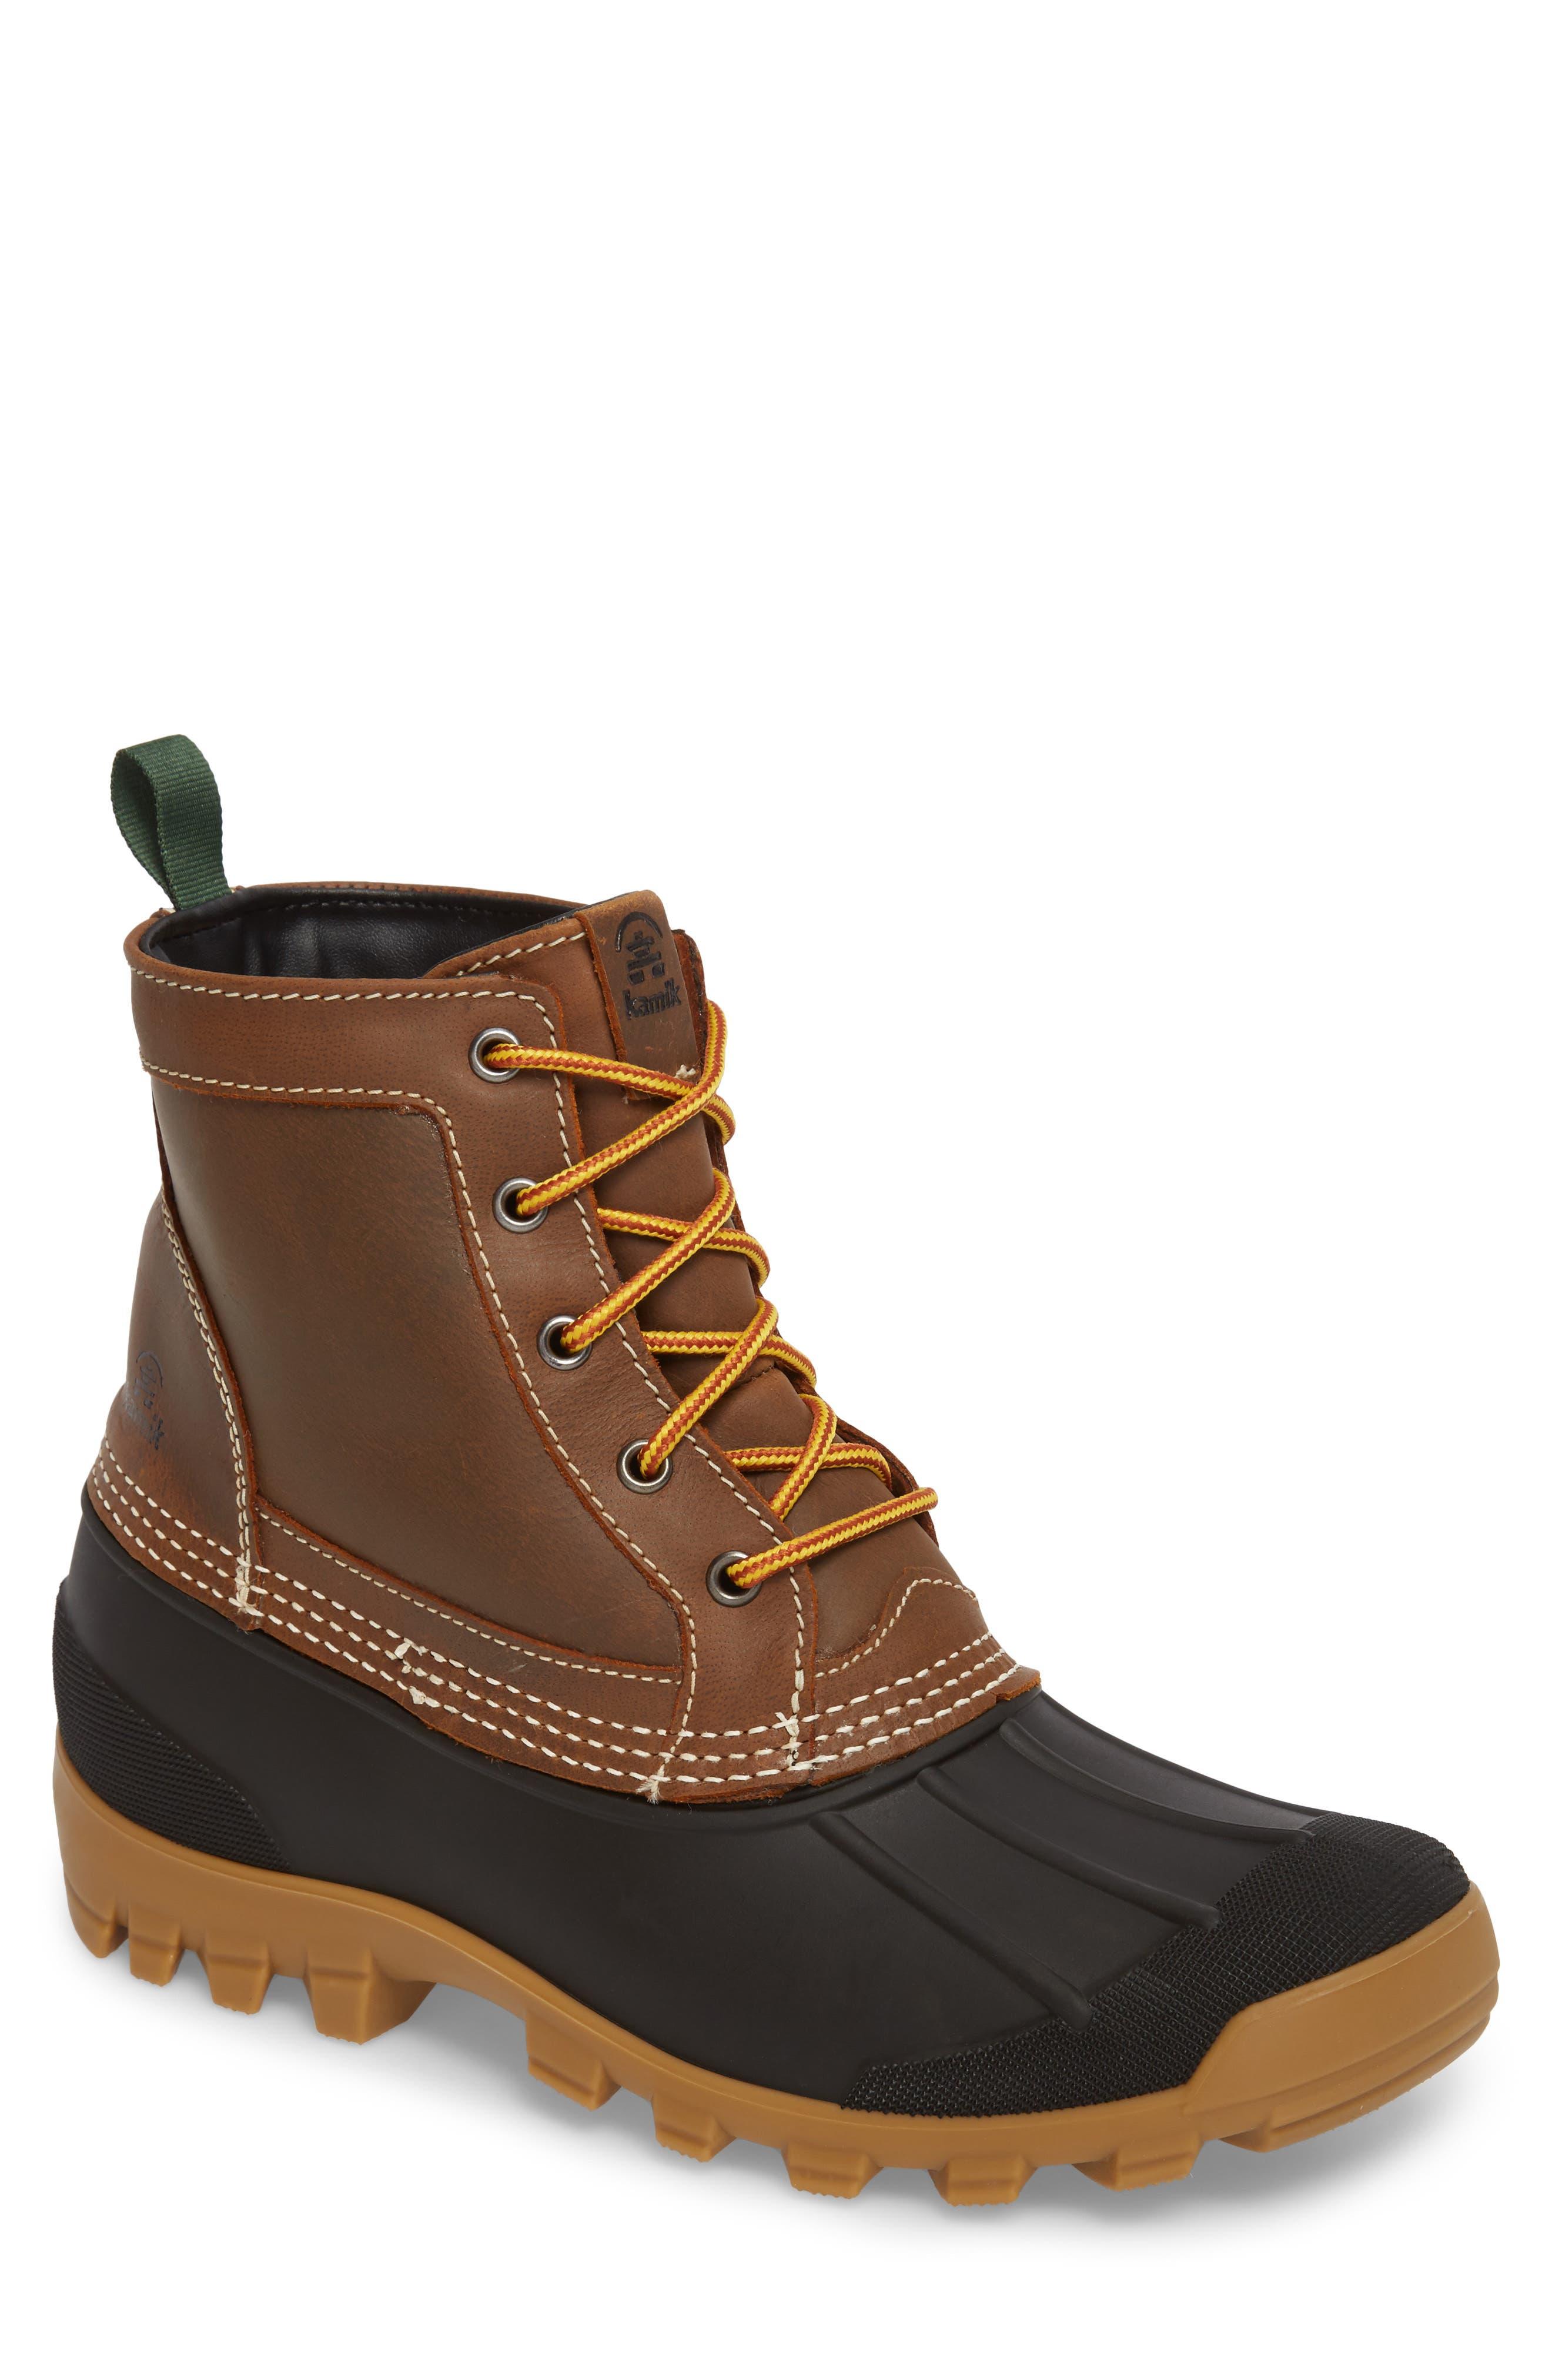 Yukon 5 Waterproof Insulated Three-Season Boot,                             Main thumbnail 1, color,                             201